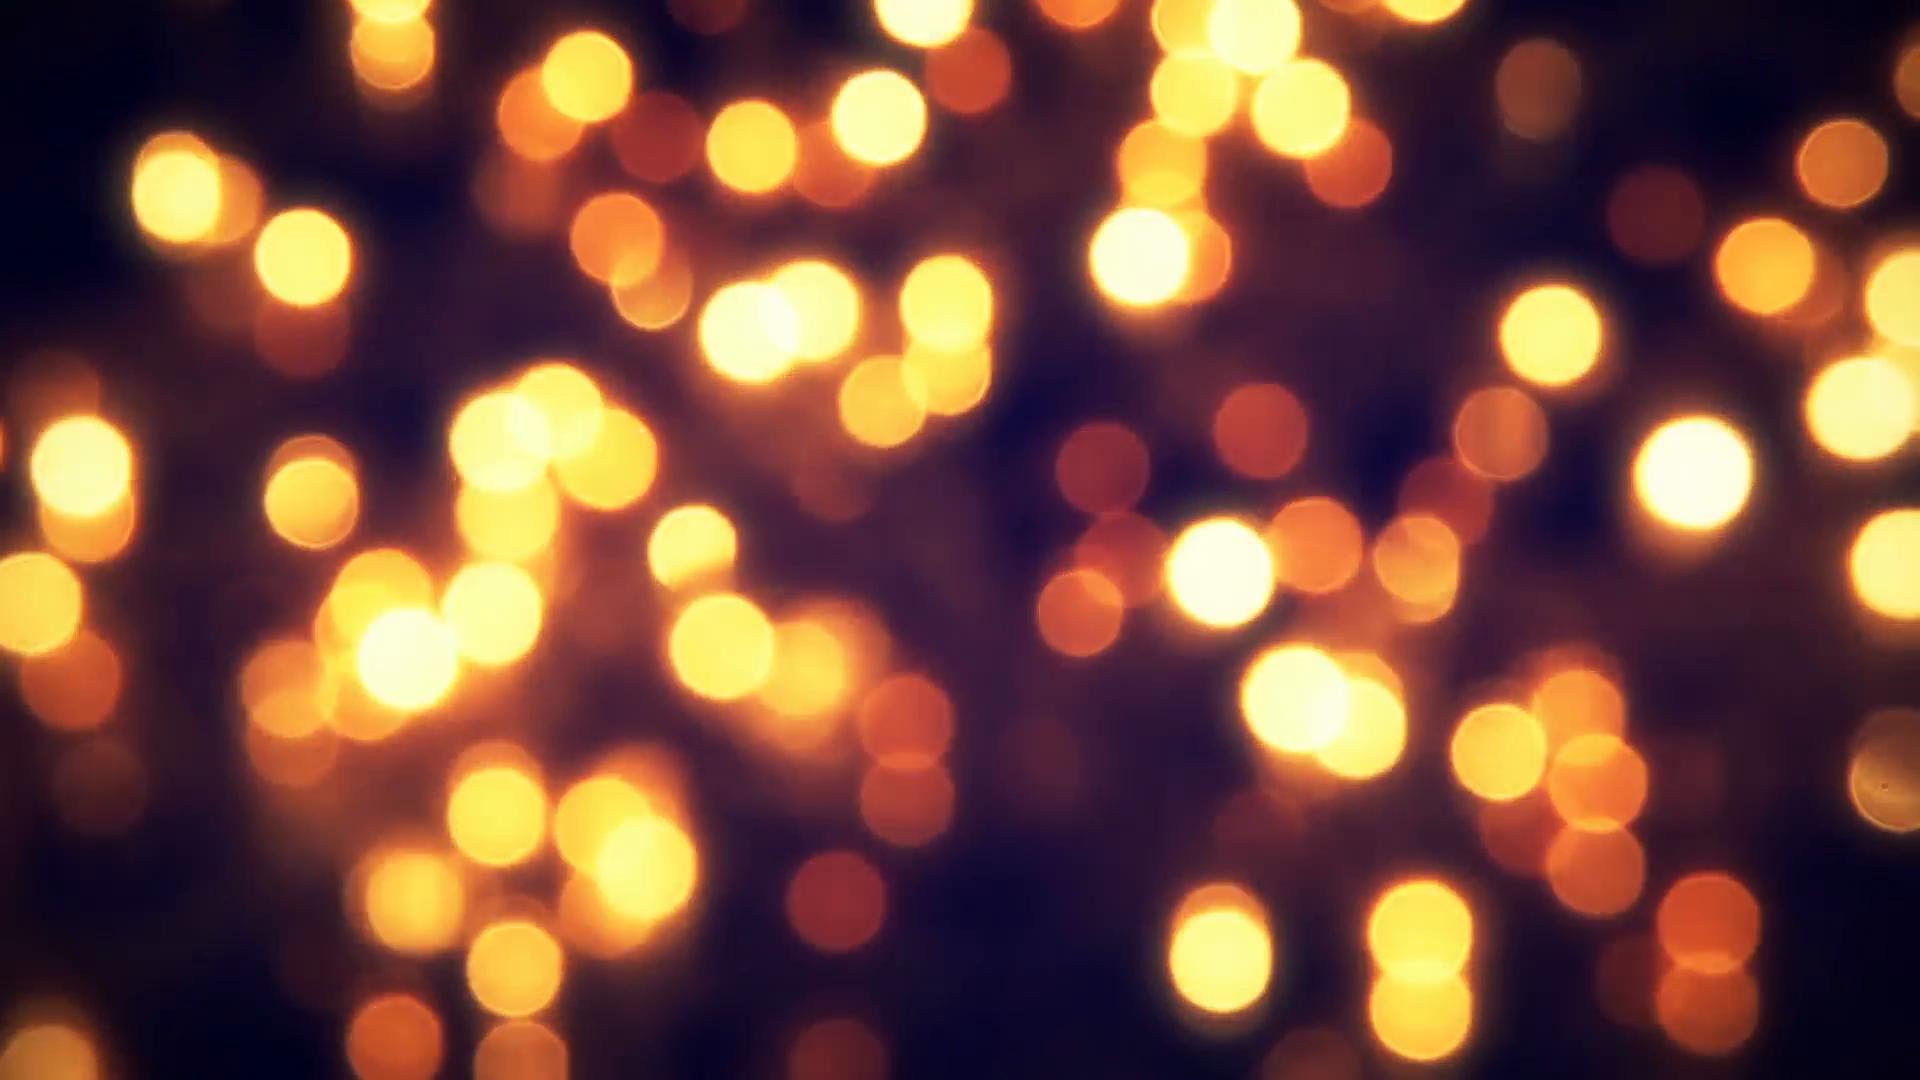 flashing christmas lights bokeh seamless loop background stock video